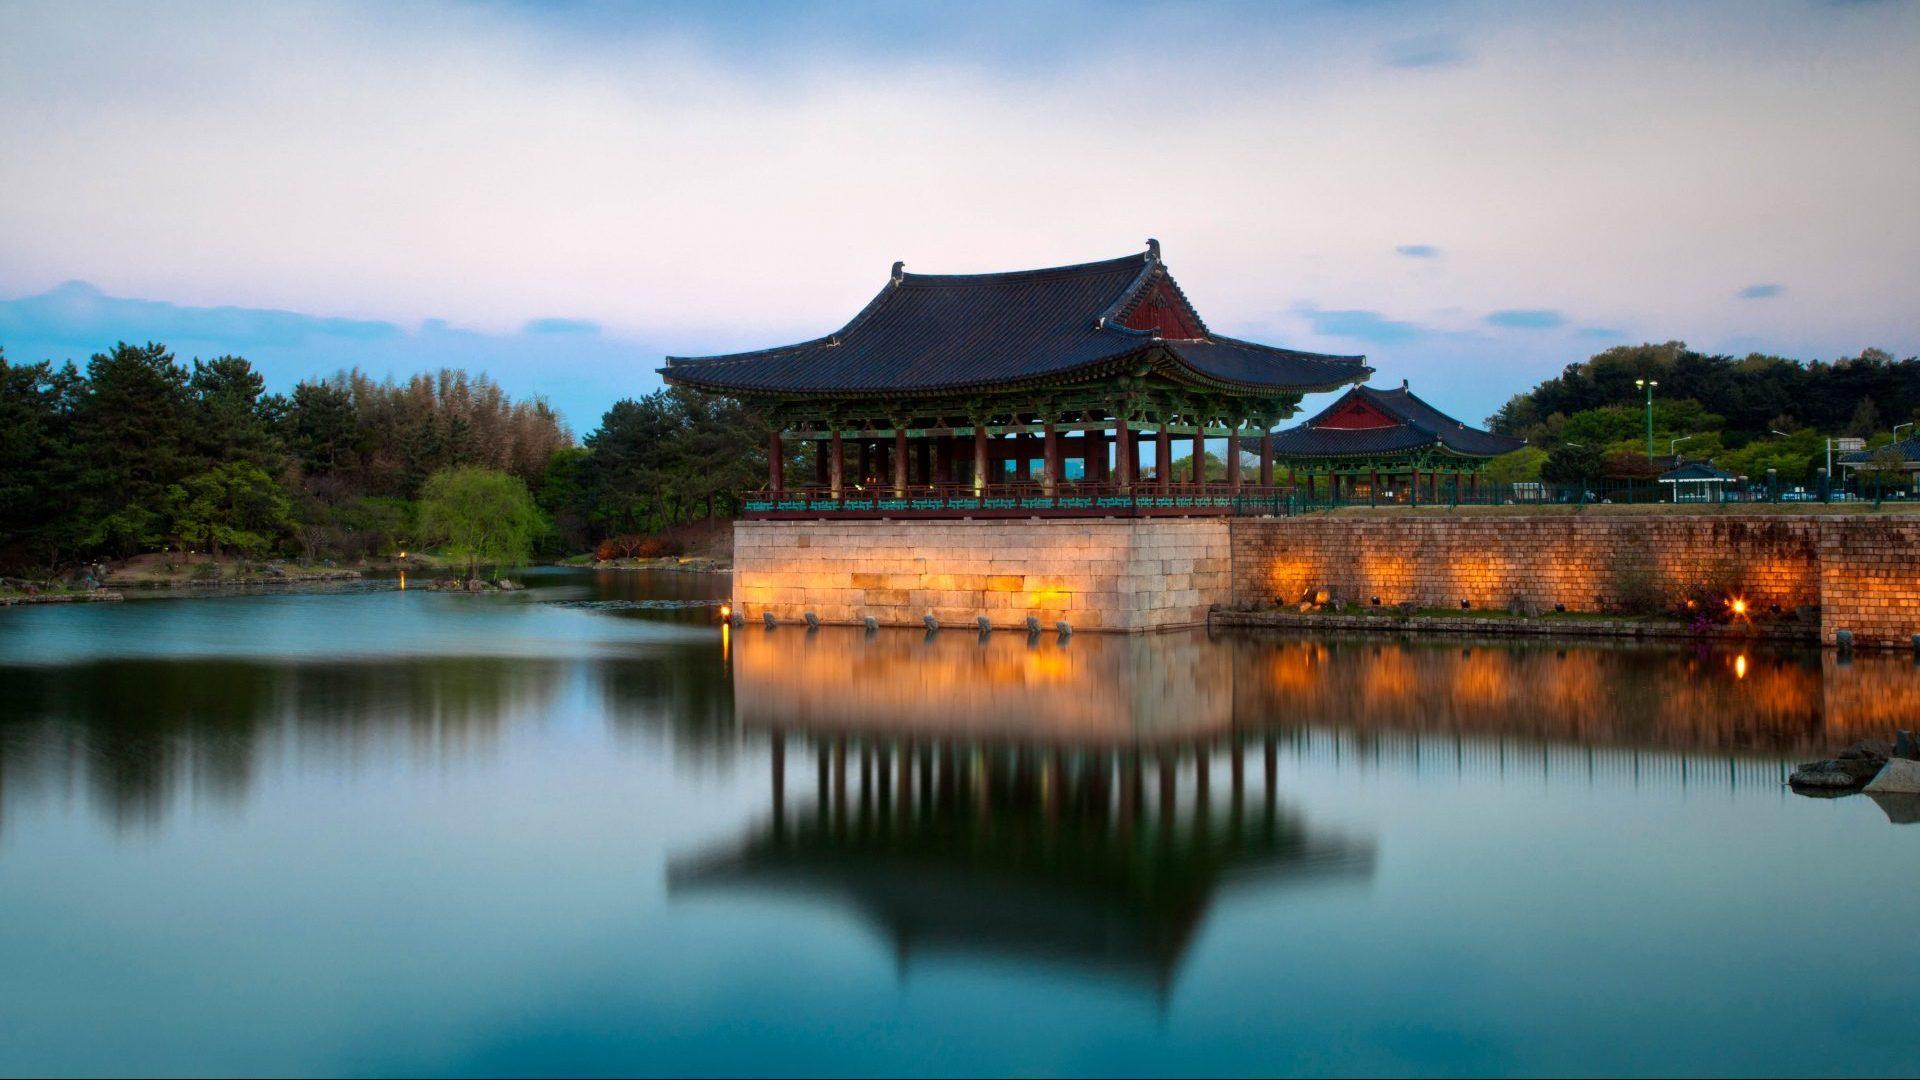 Gyeongju, Anapji Pond in South Korea with GeoEx